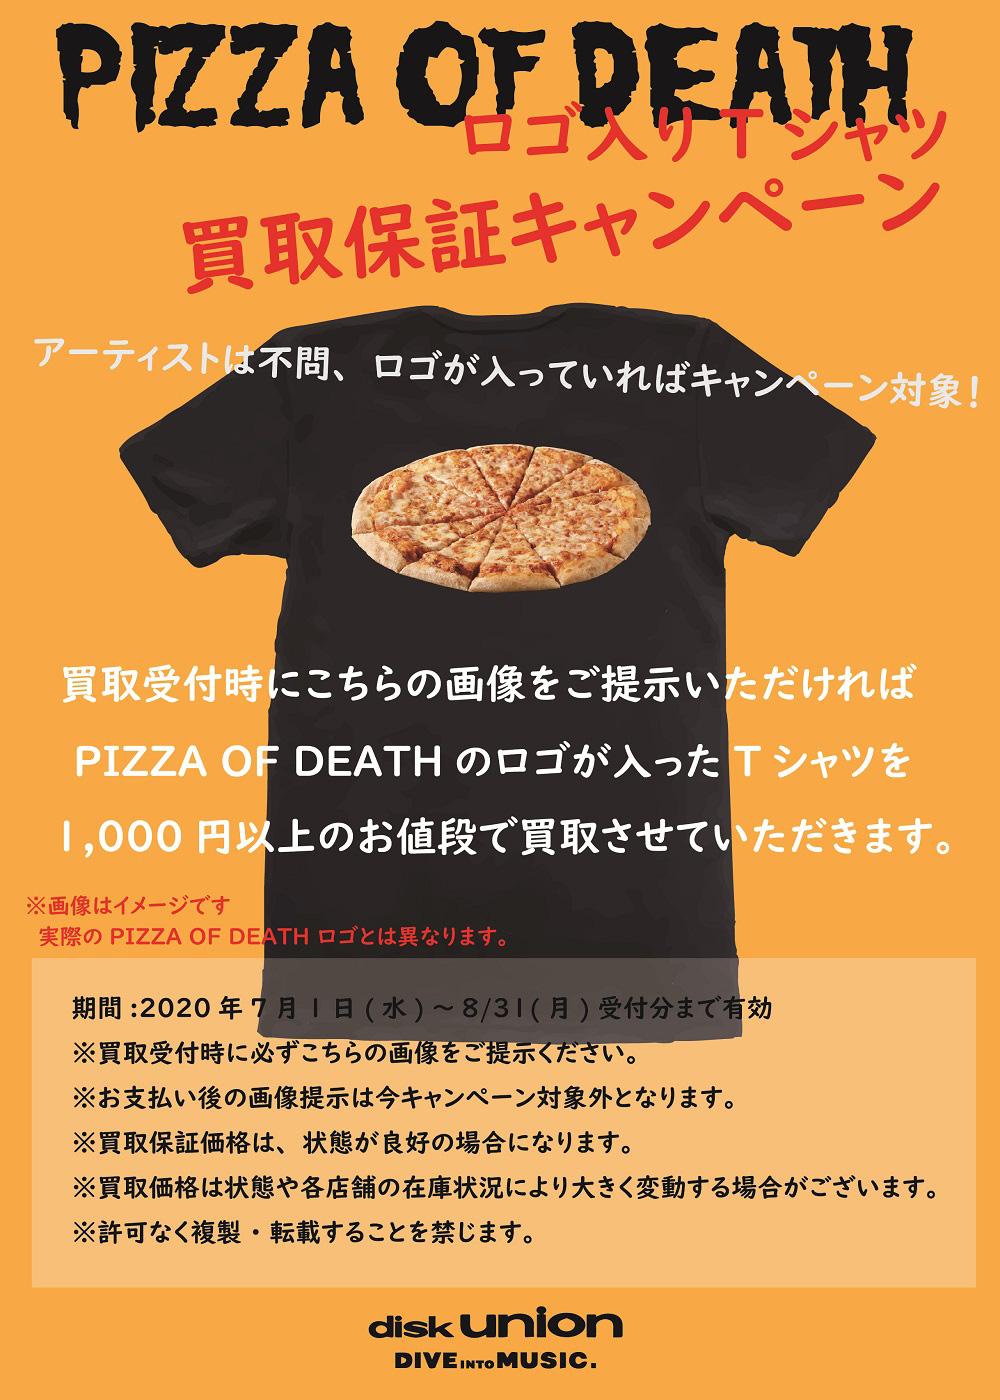 PIZZA OF DEATH ロゴ入りTシャツ買取保証